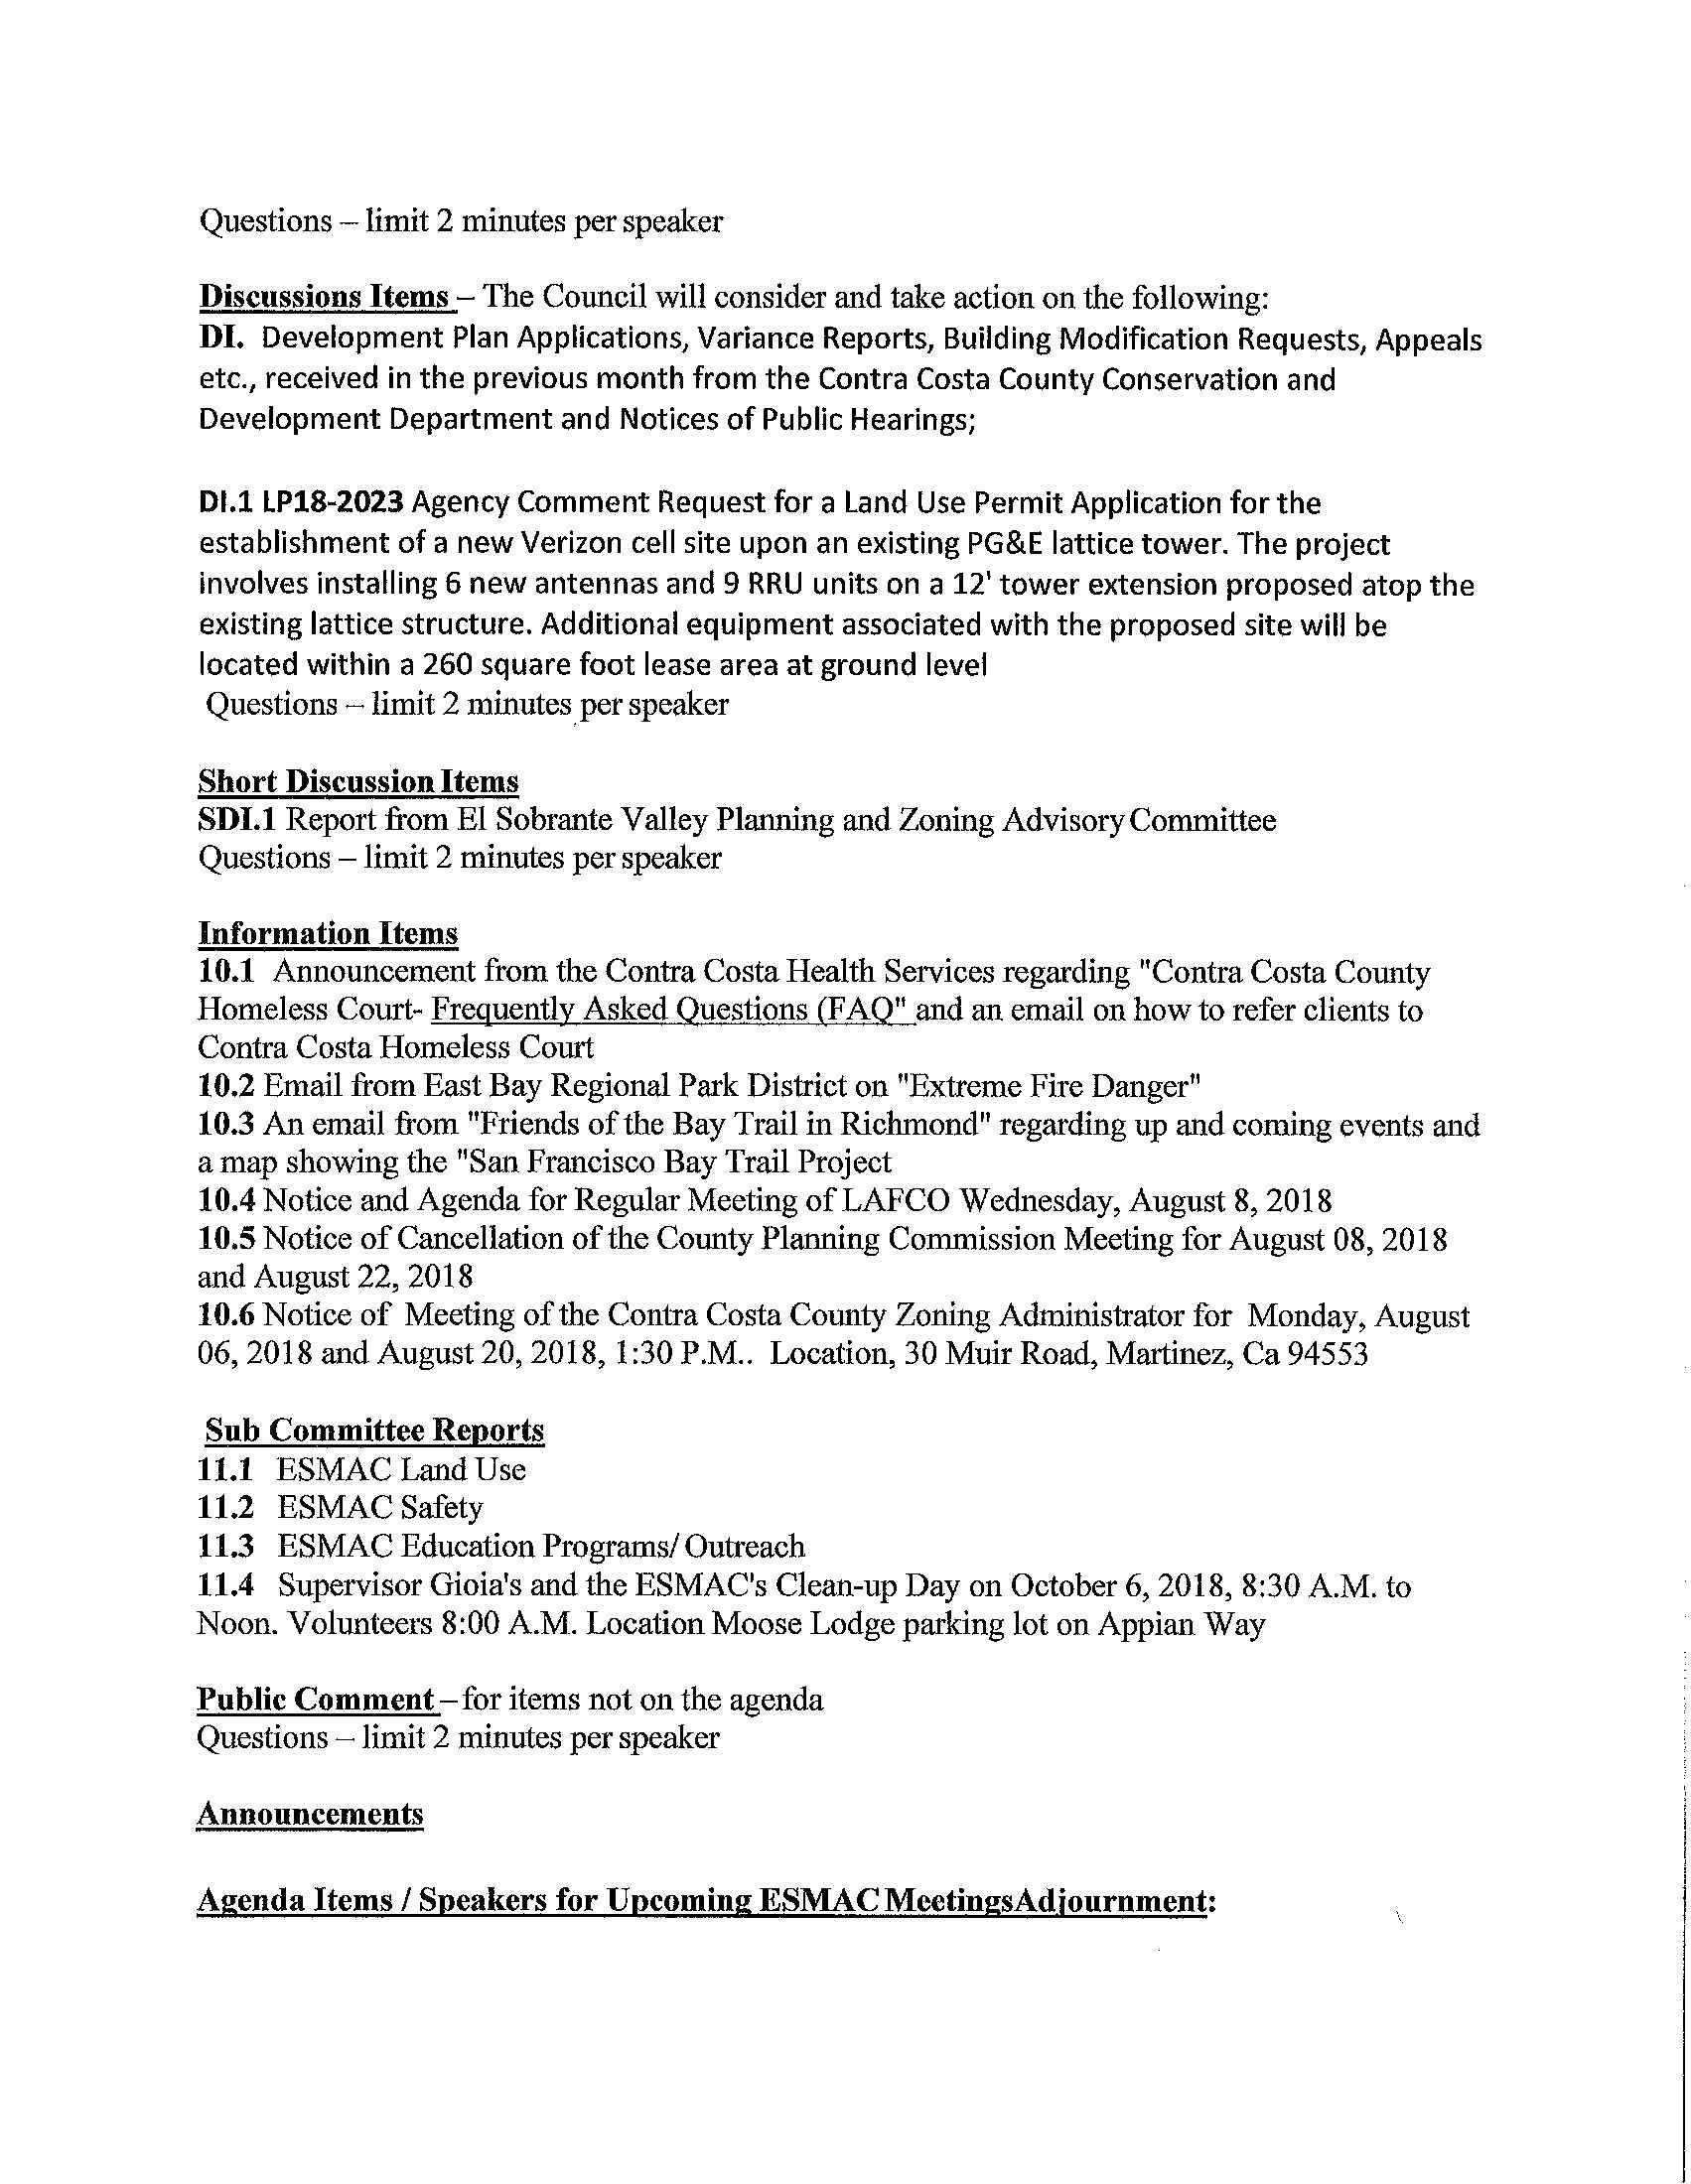 ESMAC Agenda 09.12.2018 (22 Pages)_2.jpg